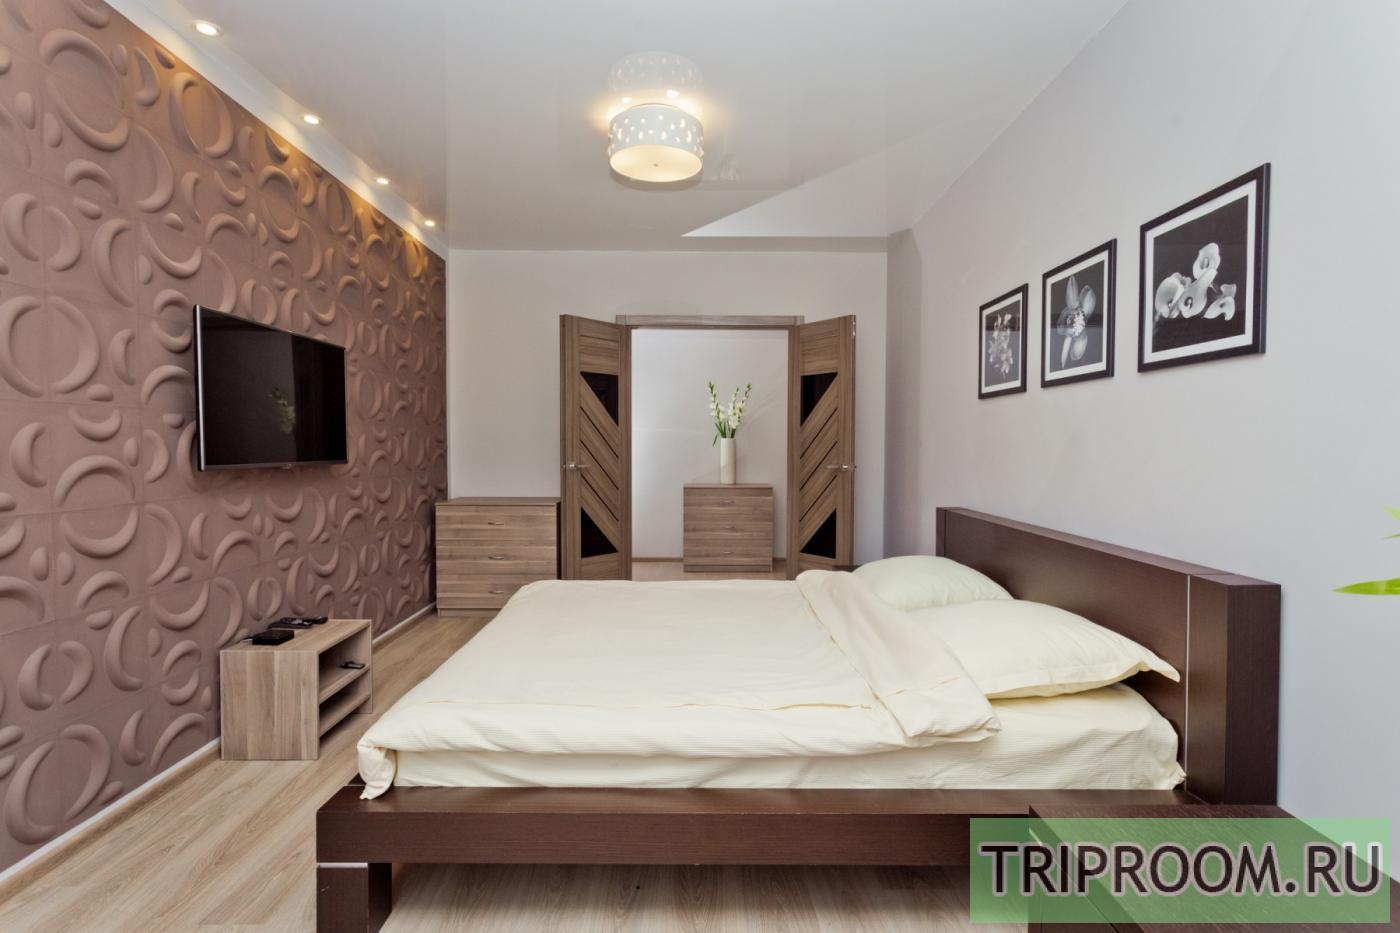 2-комнатная квартира посуточно (вариант № 26145), ул. Звездинка улица, фото № 2